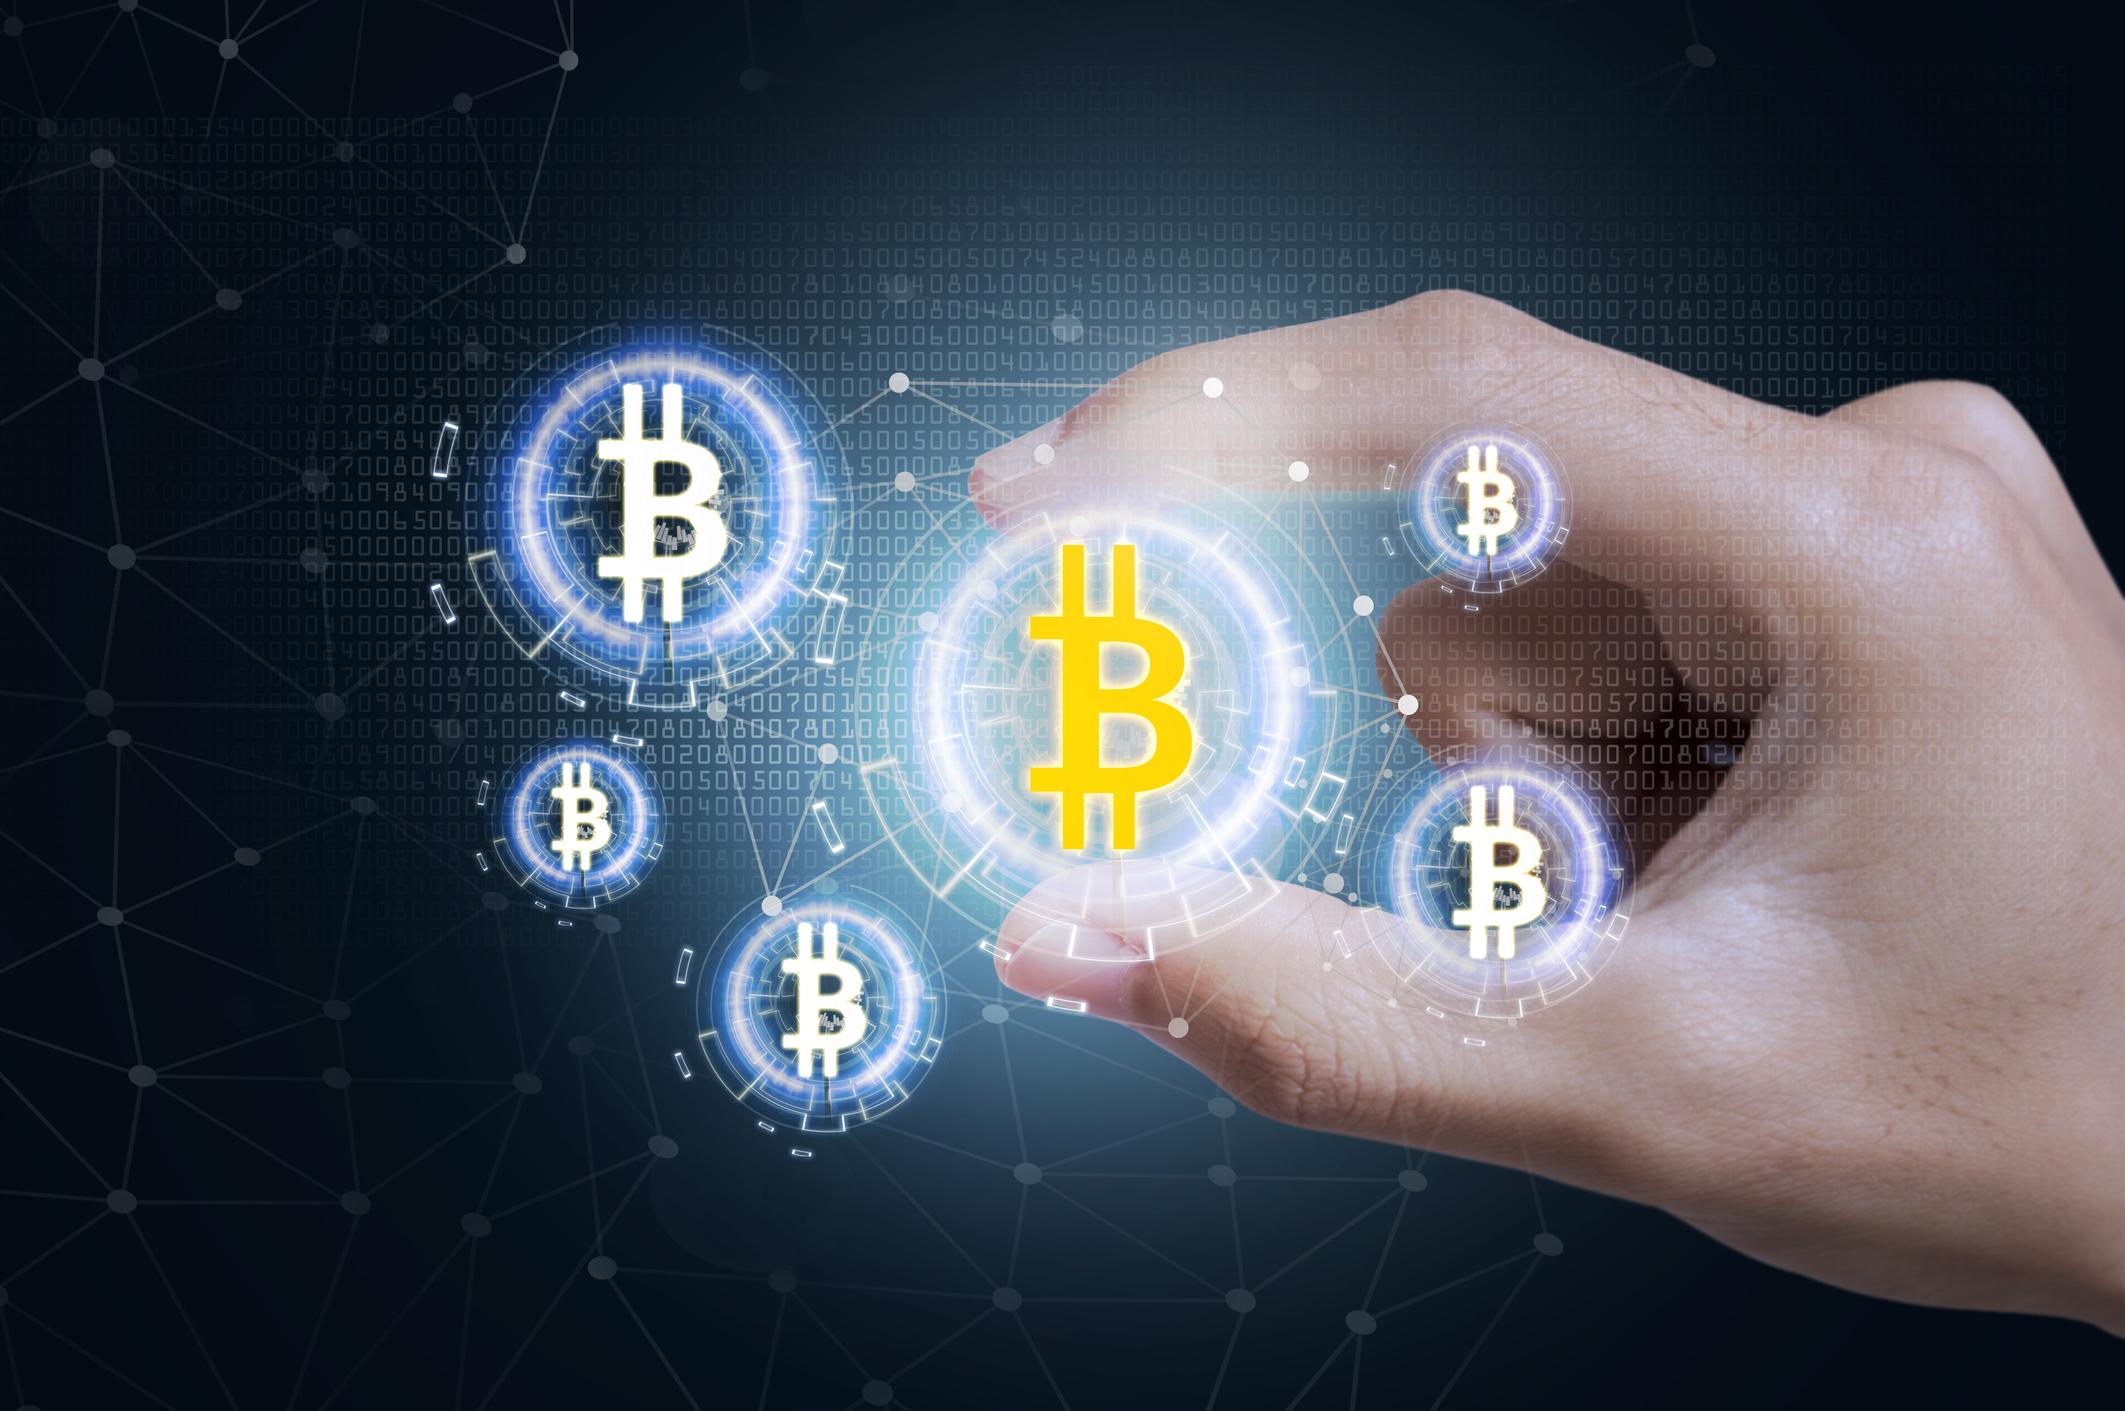 A hand holding a lit-up bitcoin symbol.